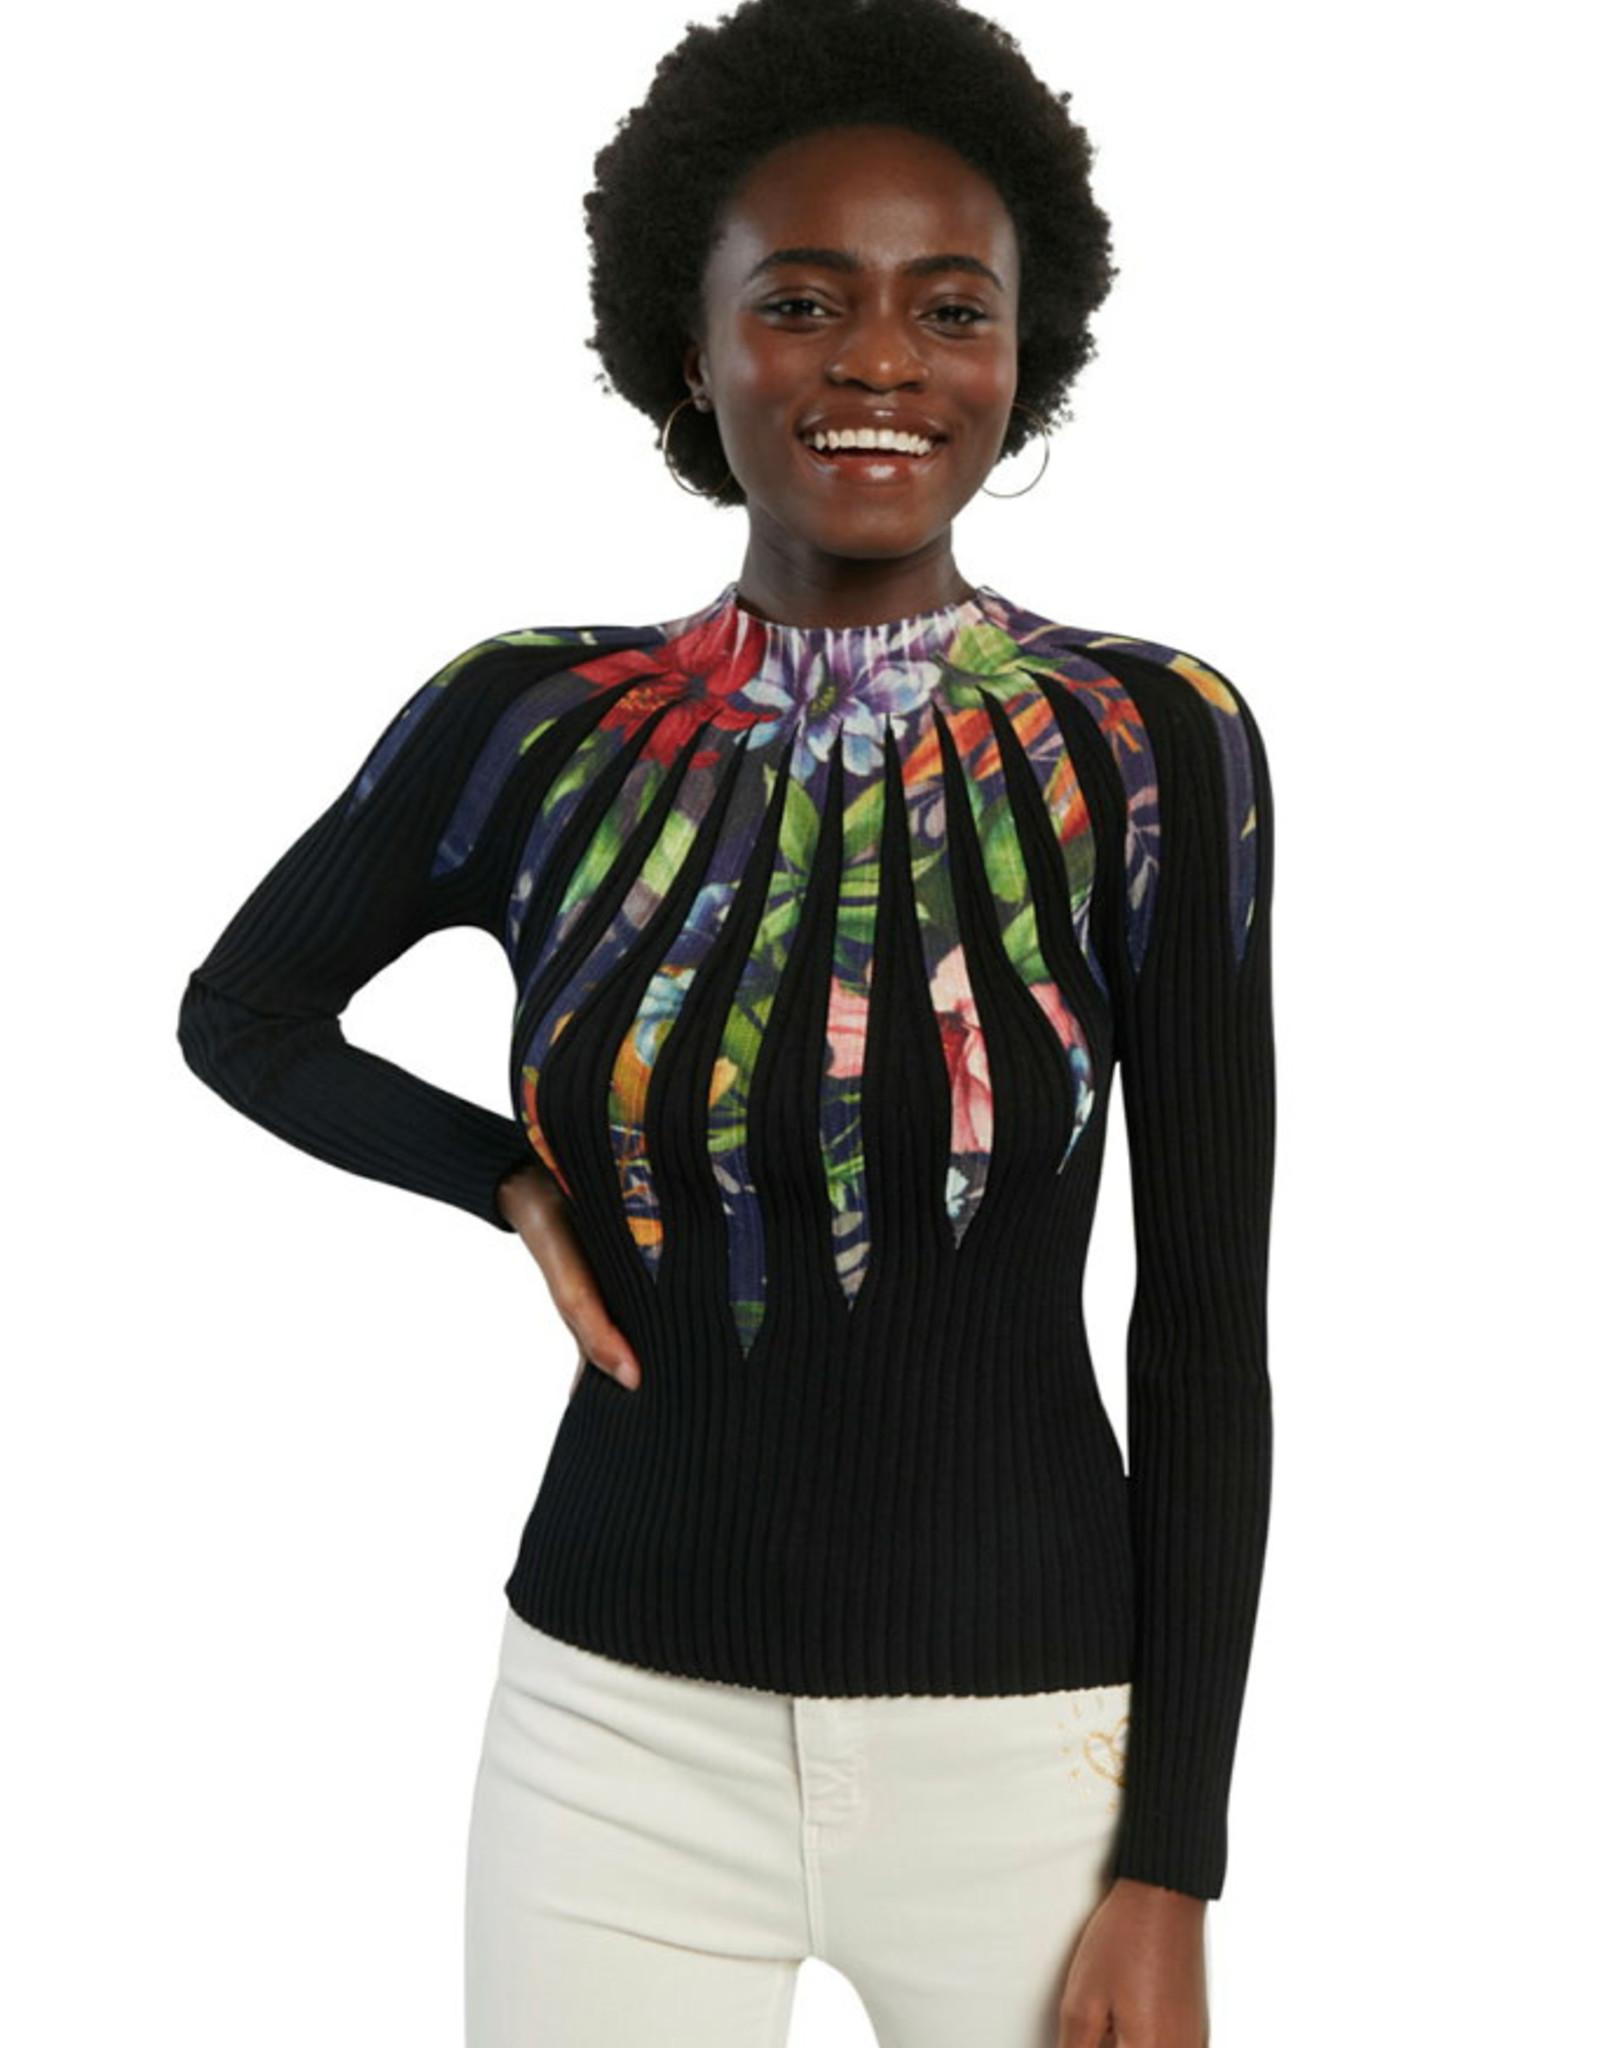 DESIG 21SWJF17 2000 Darwin Black Pullover Top